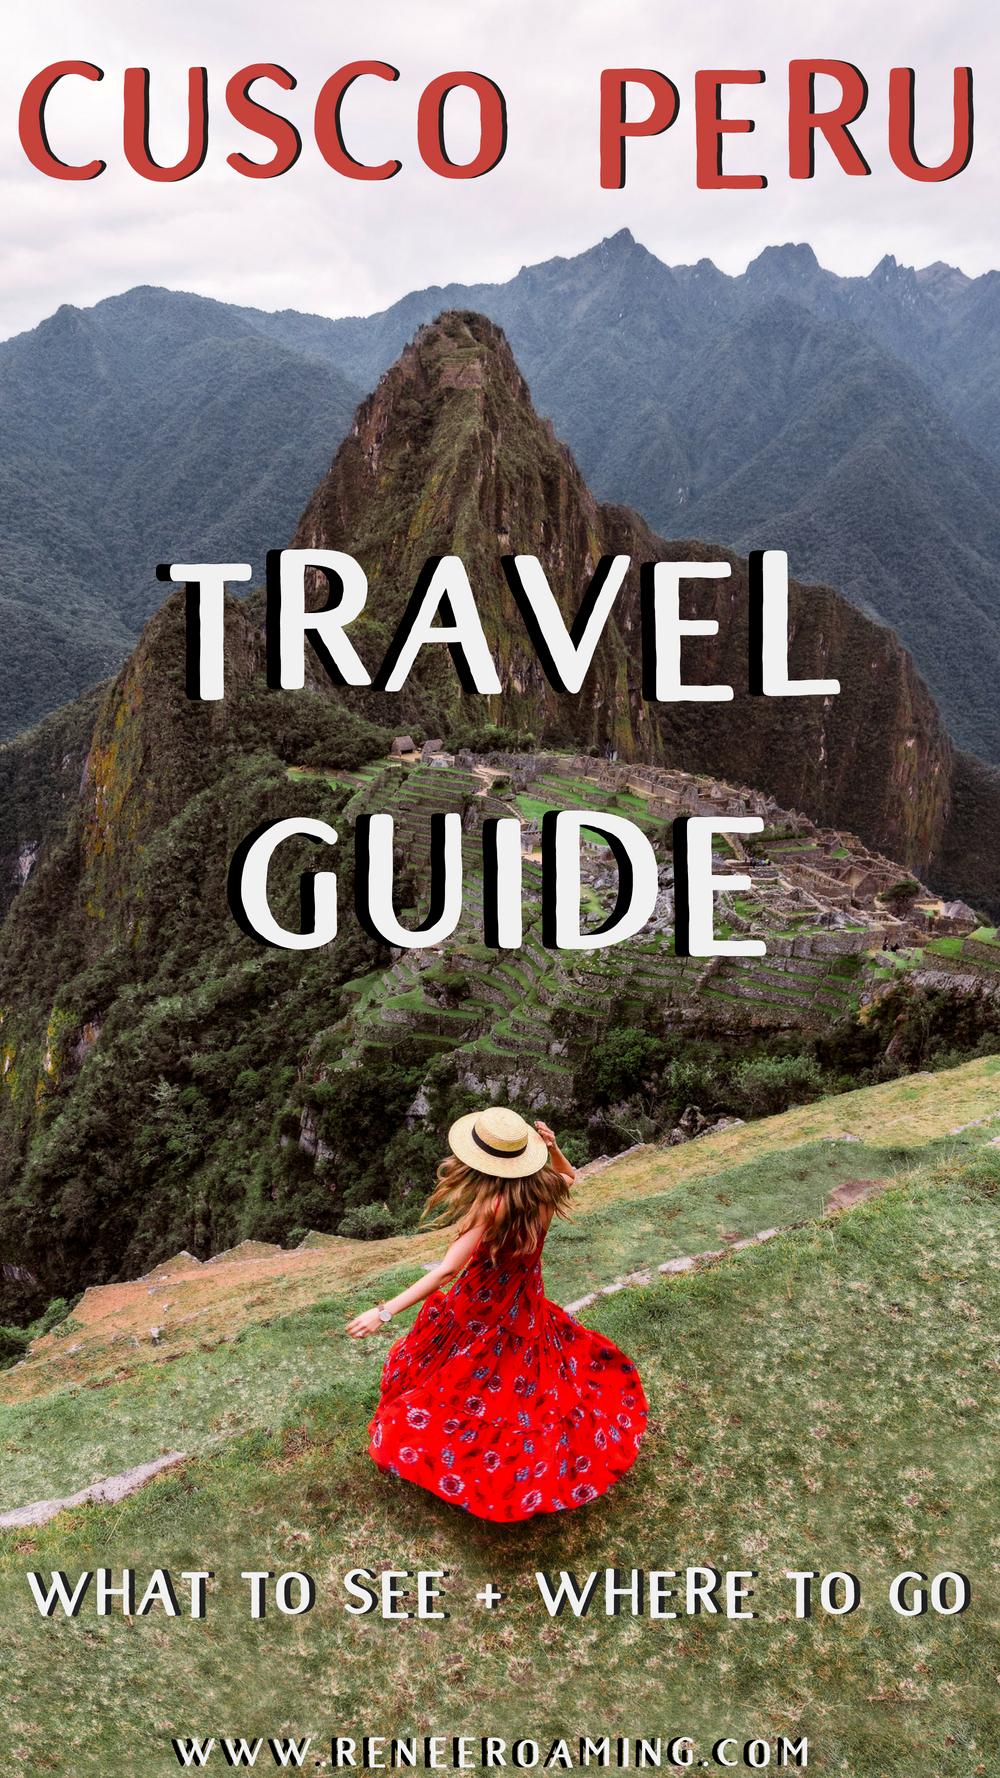 Best Things To Do In & Around Cusco Peru